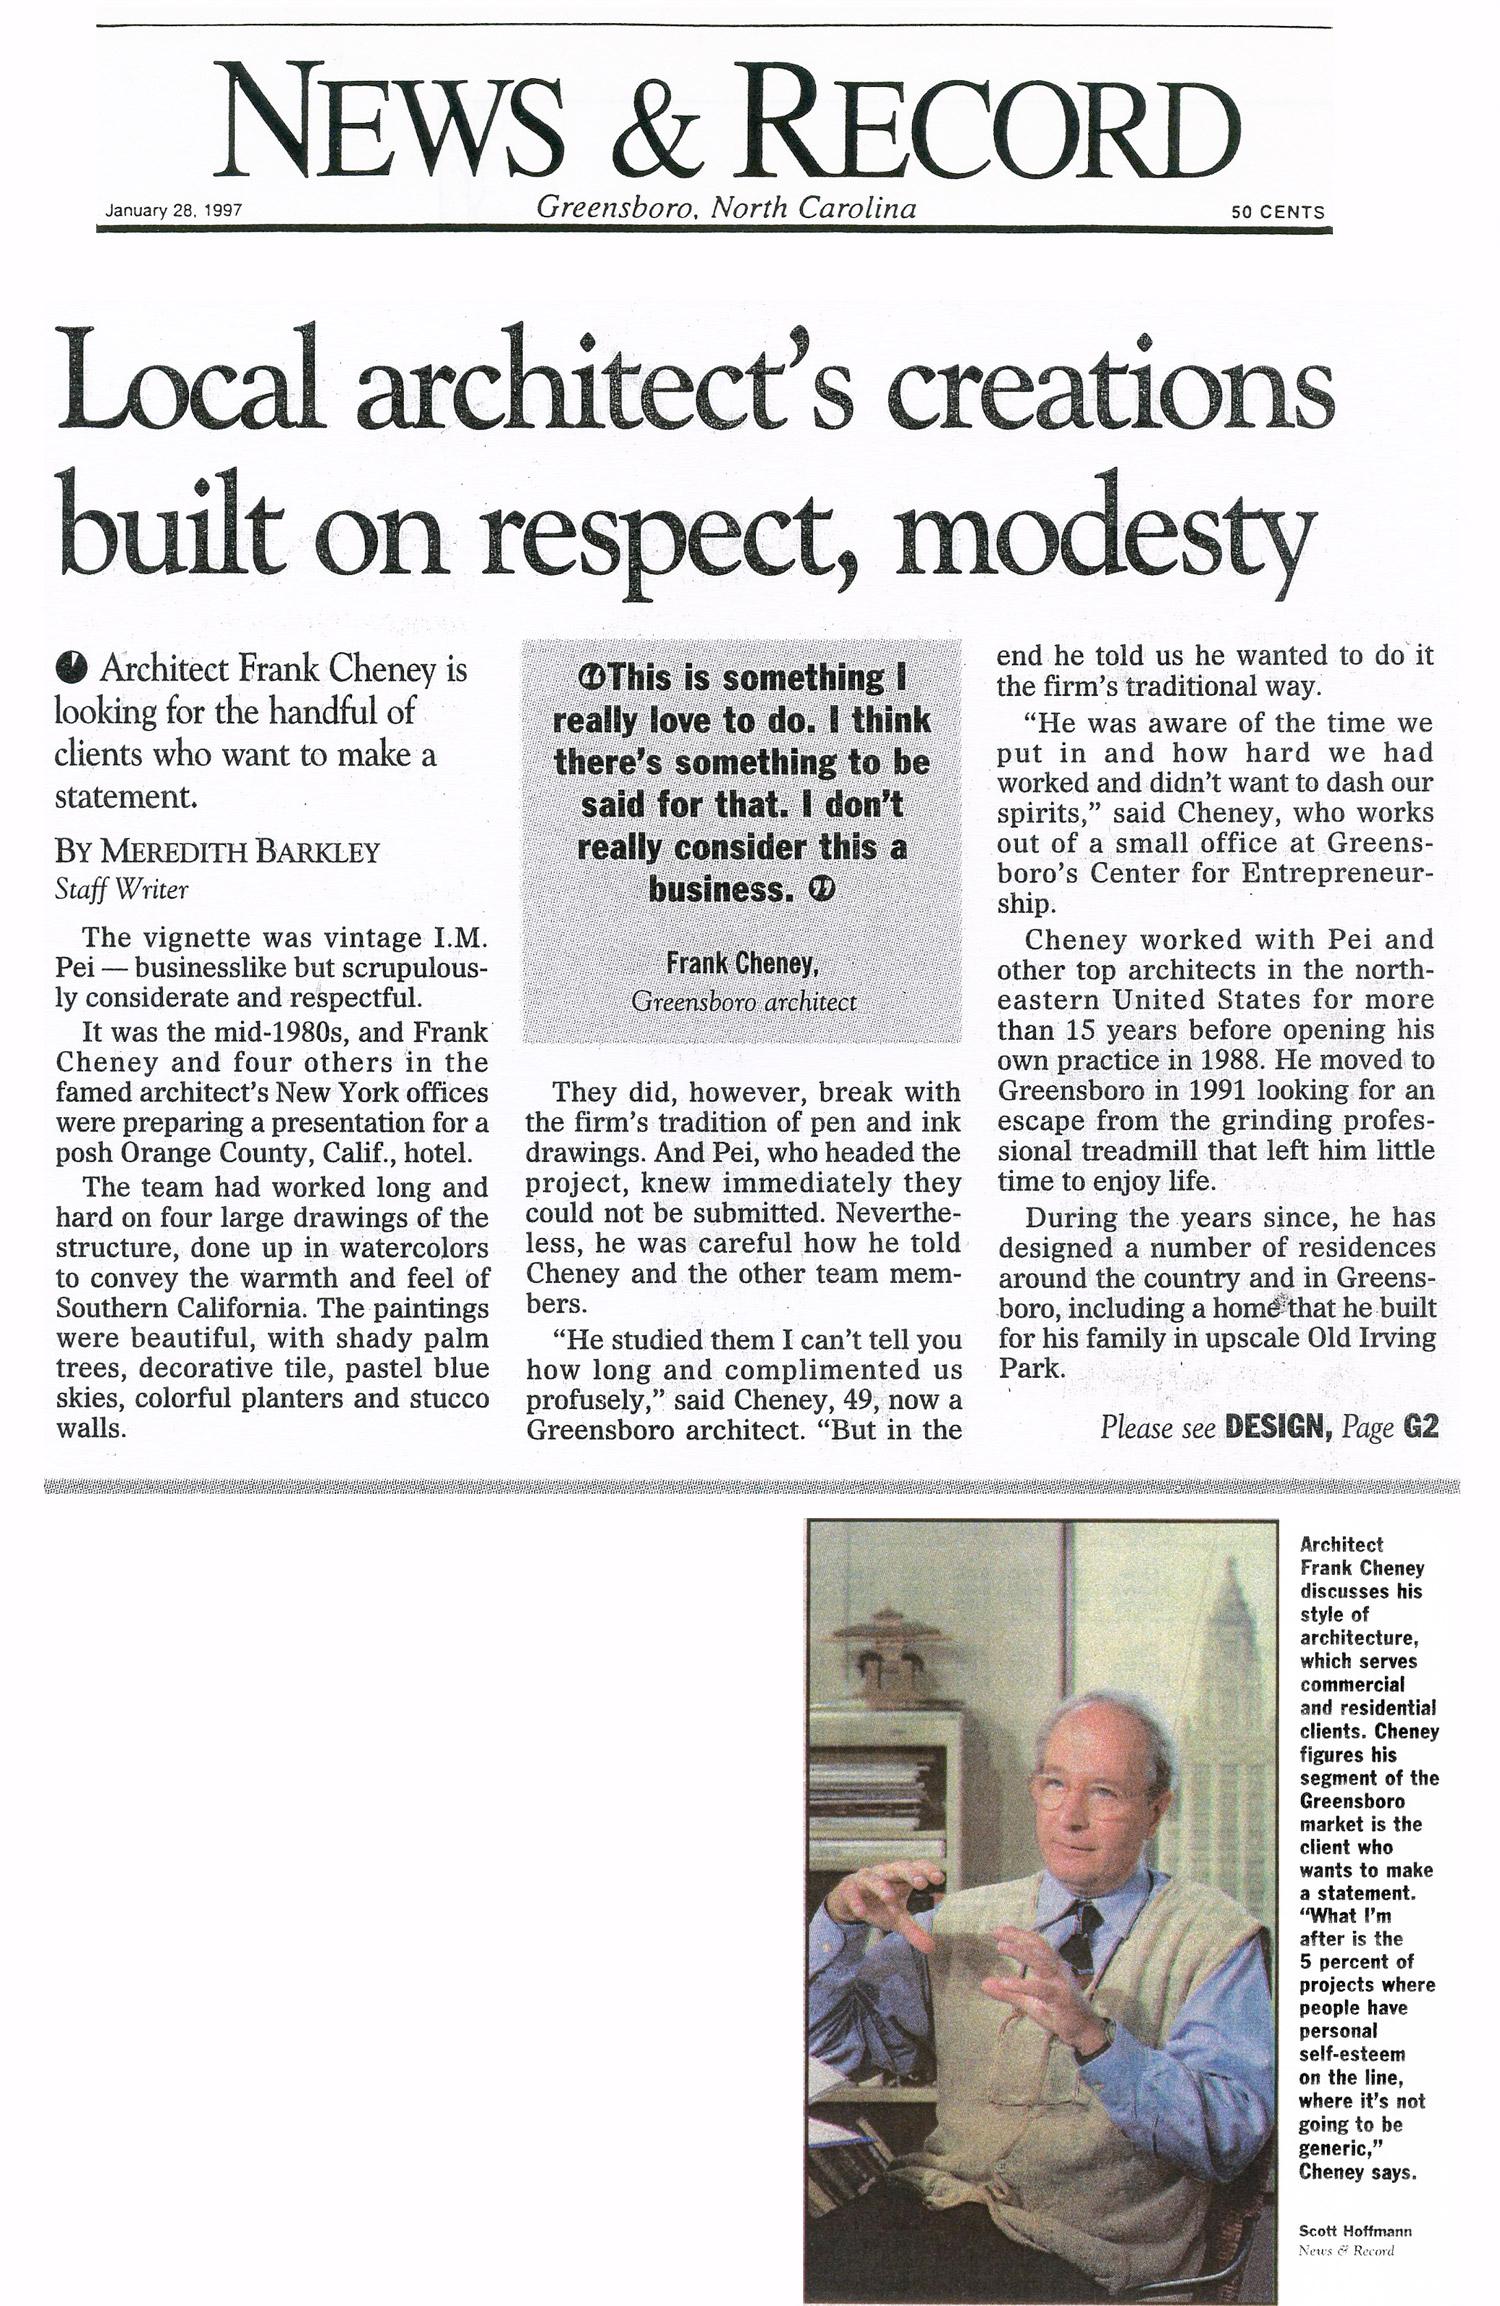 frank-cheney-architect-greensboro-news-and-record-clip.jpg